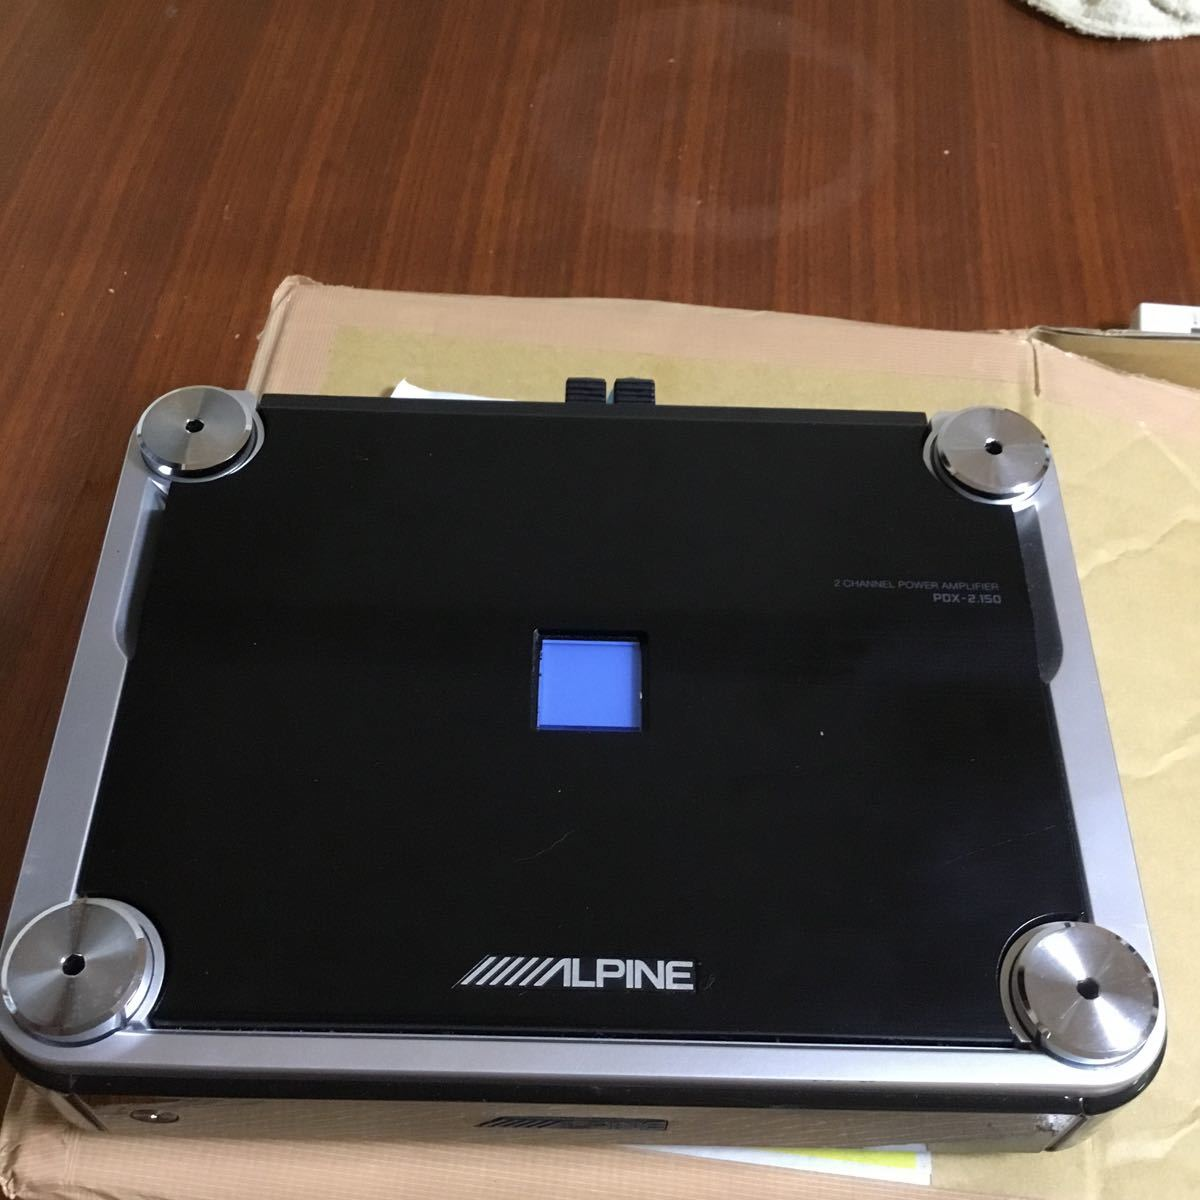 ALPINE pdx-2 150パワーアンプ 美品ですアルパイン_画像5